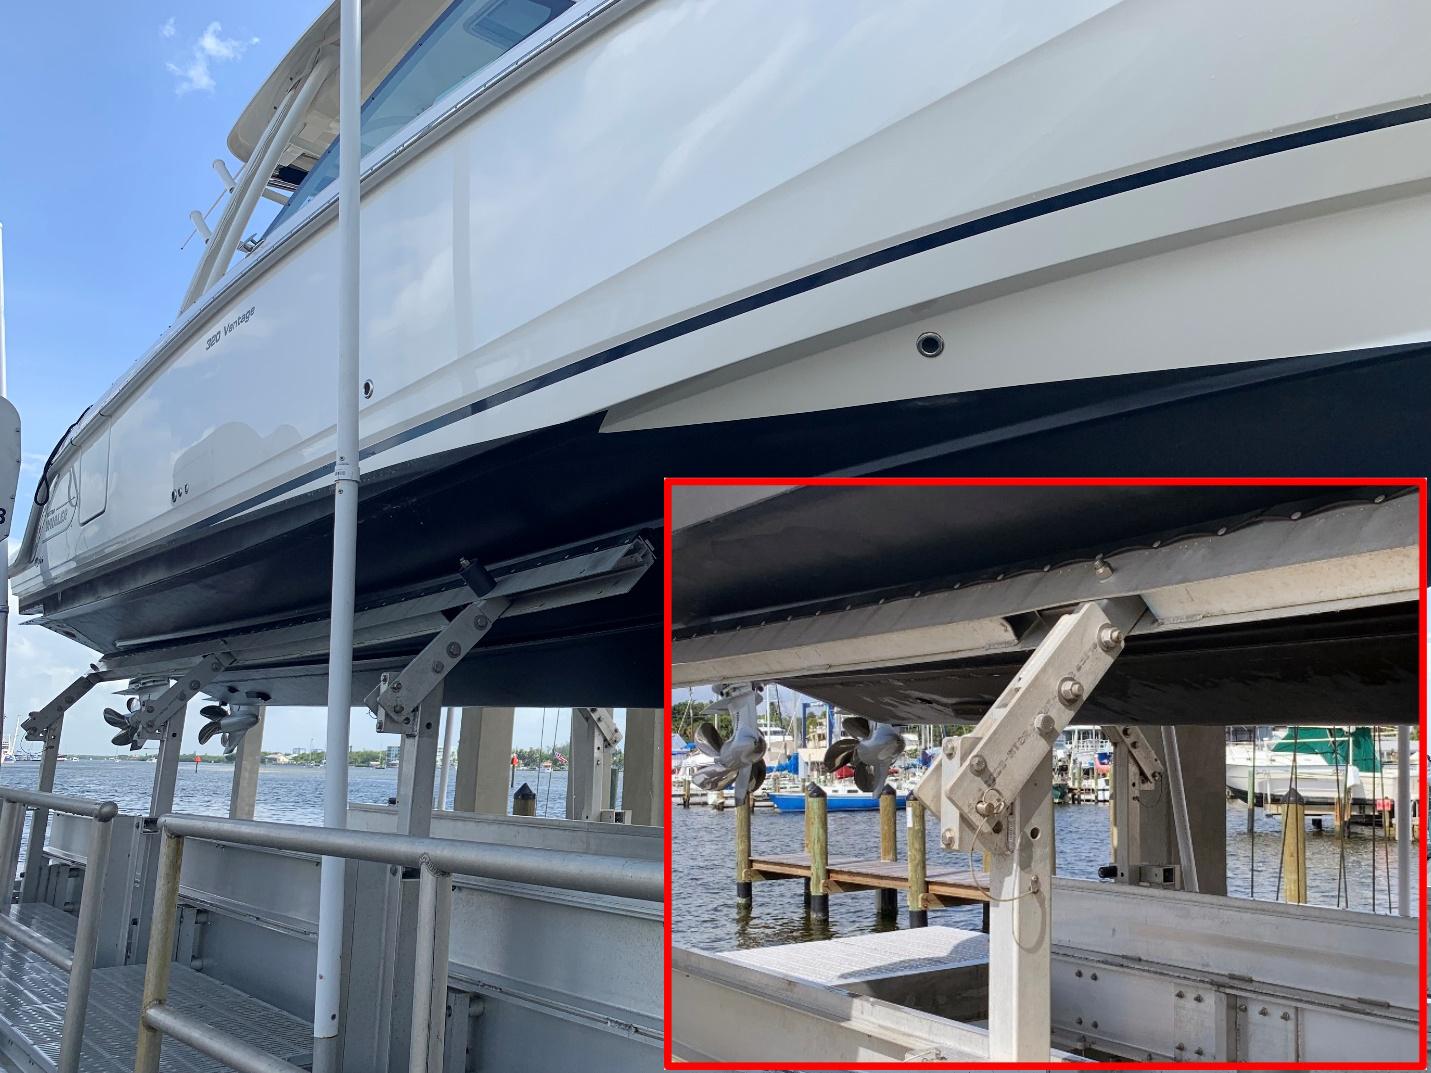 Brackets On Lift Iq Boat Lifts